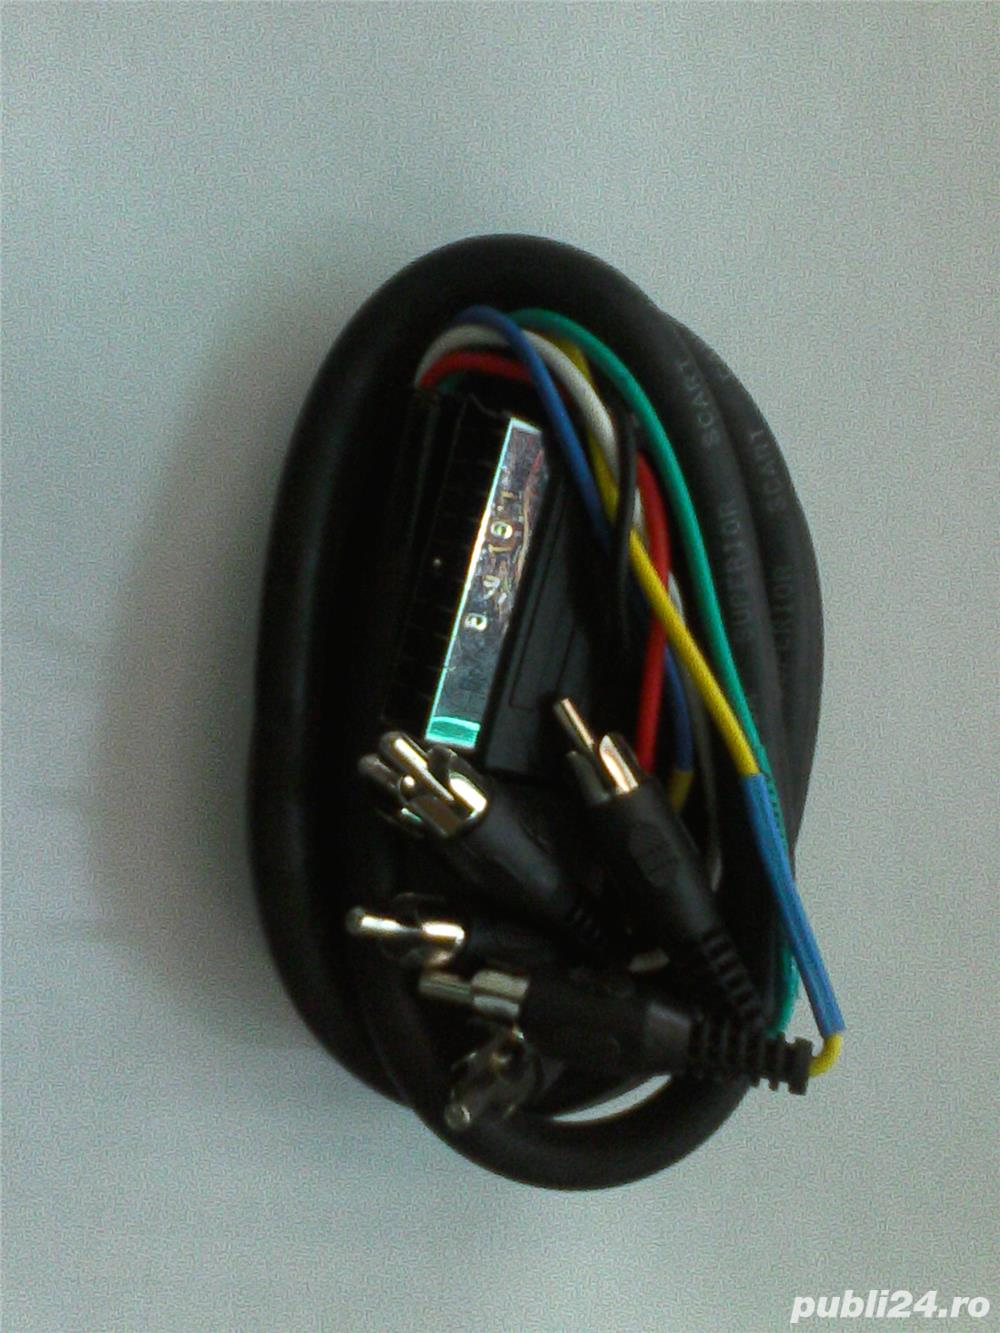 Cablu Scart -Rca 6 mufe audio video. 7 BUC.